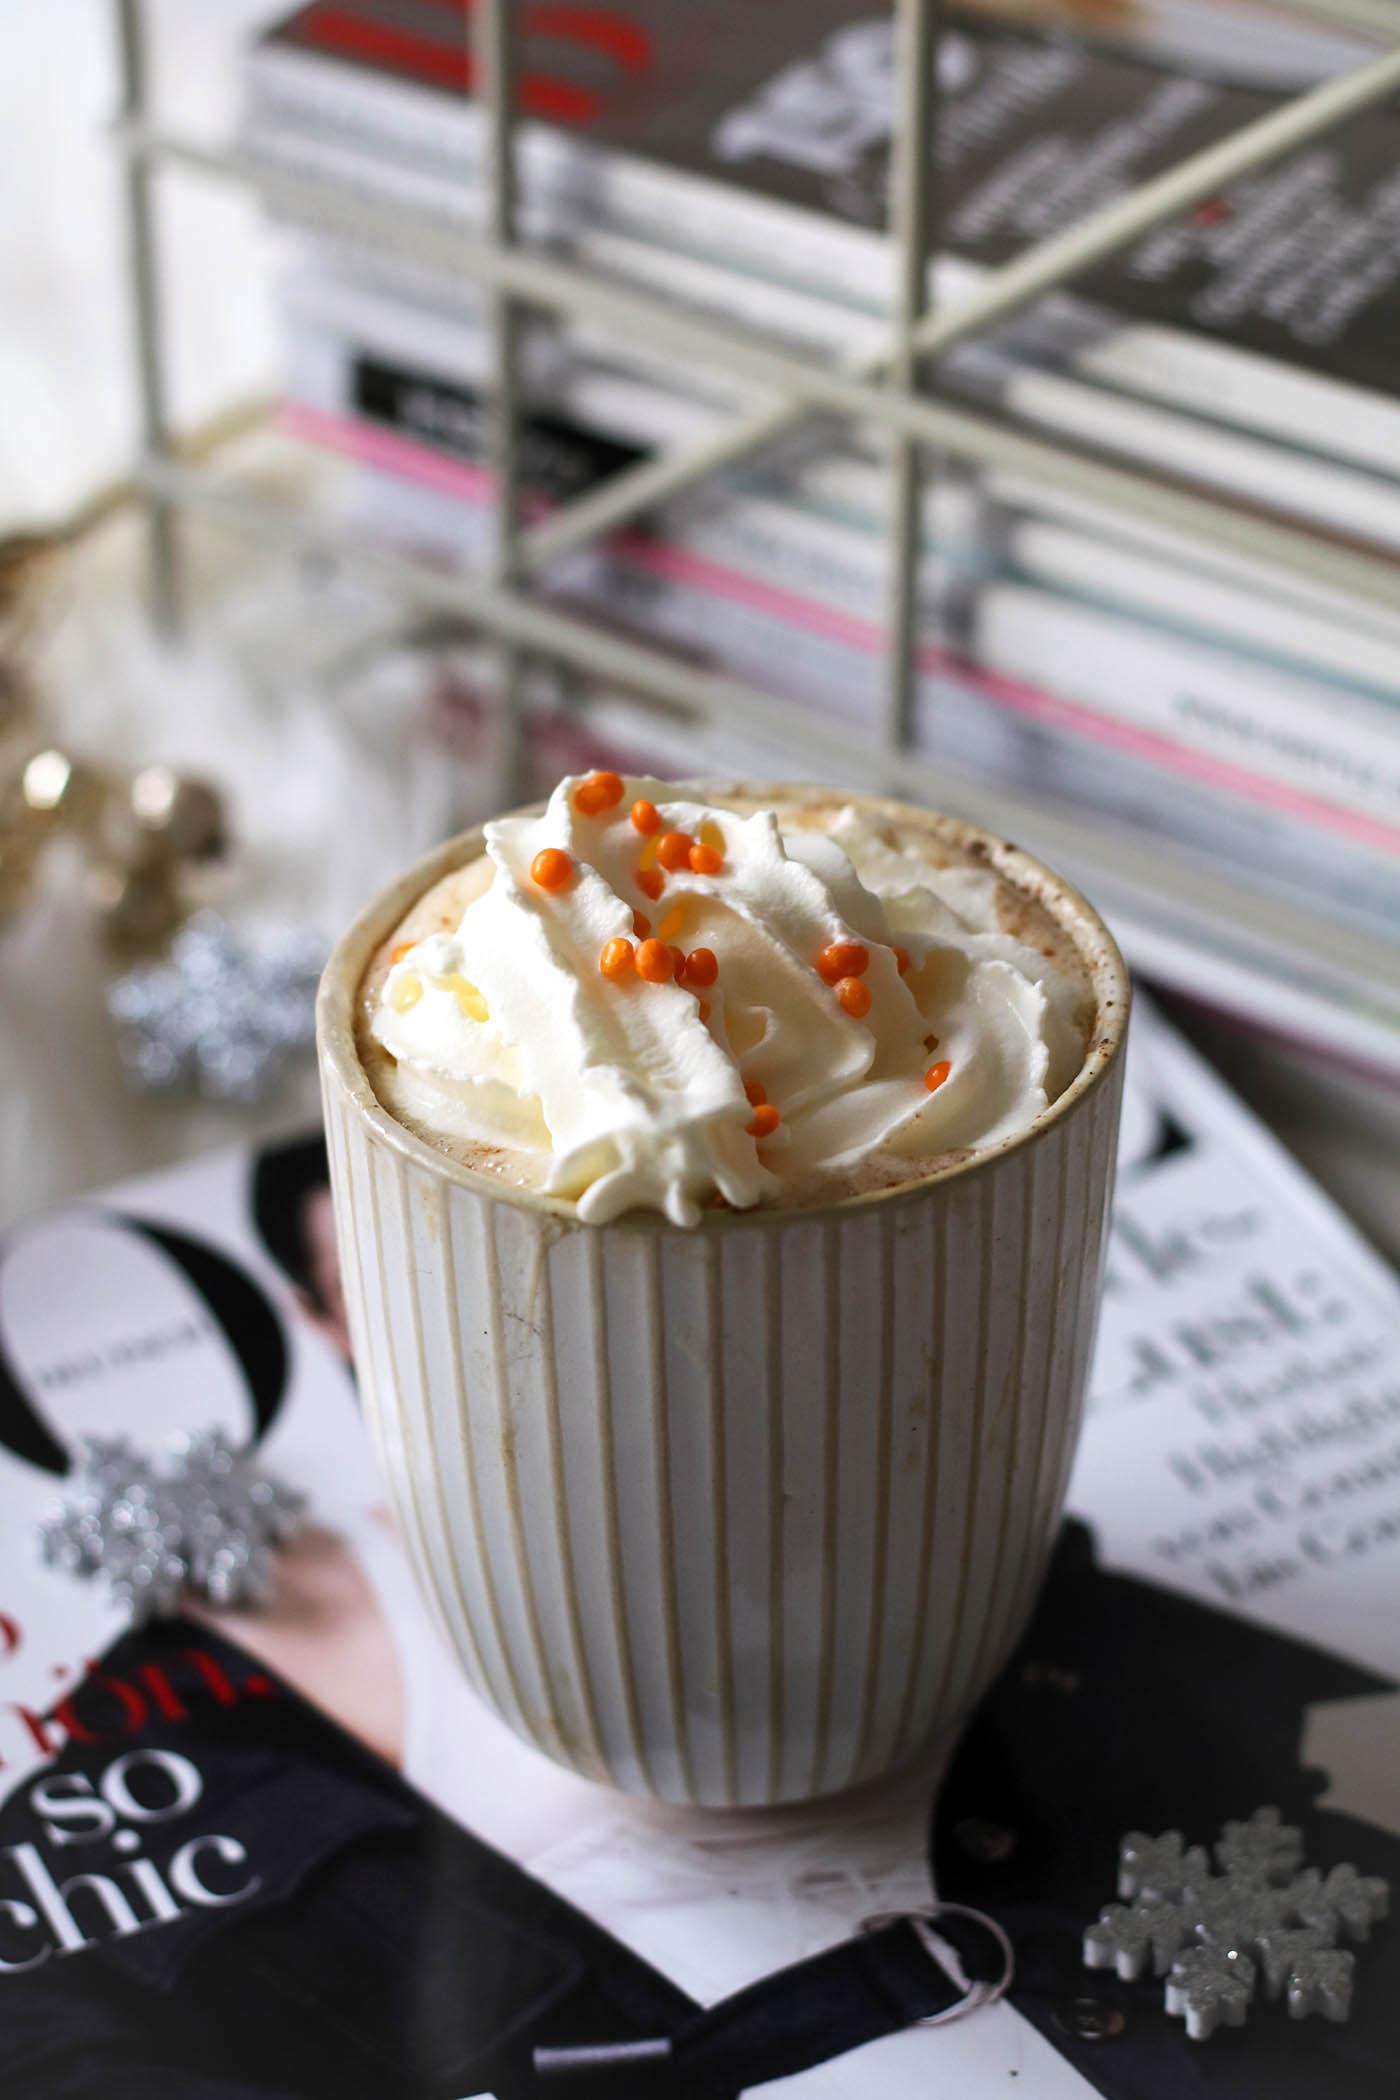 fashionpassionlove-food-rezept-weihnachtliche-cappucchino-petite-catrin2